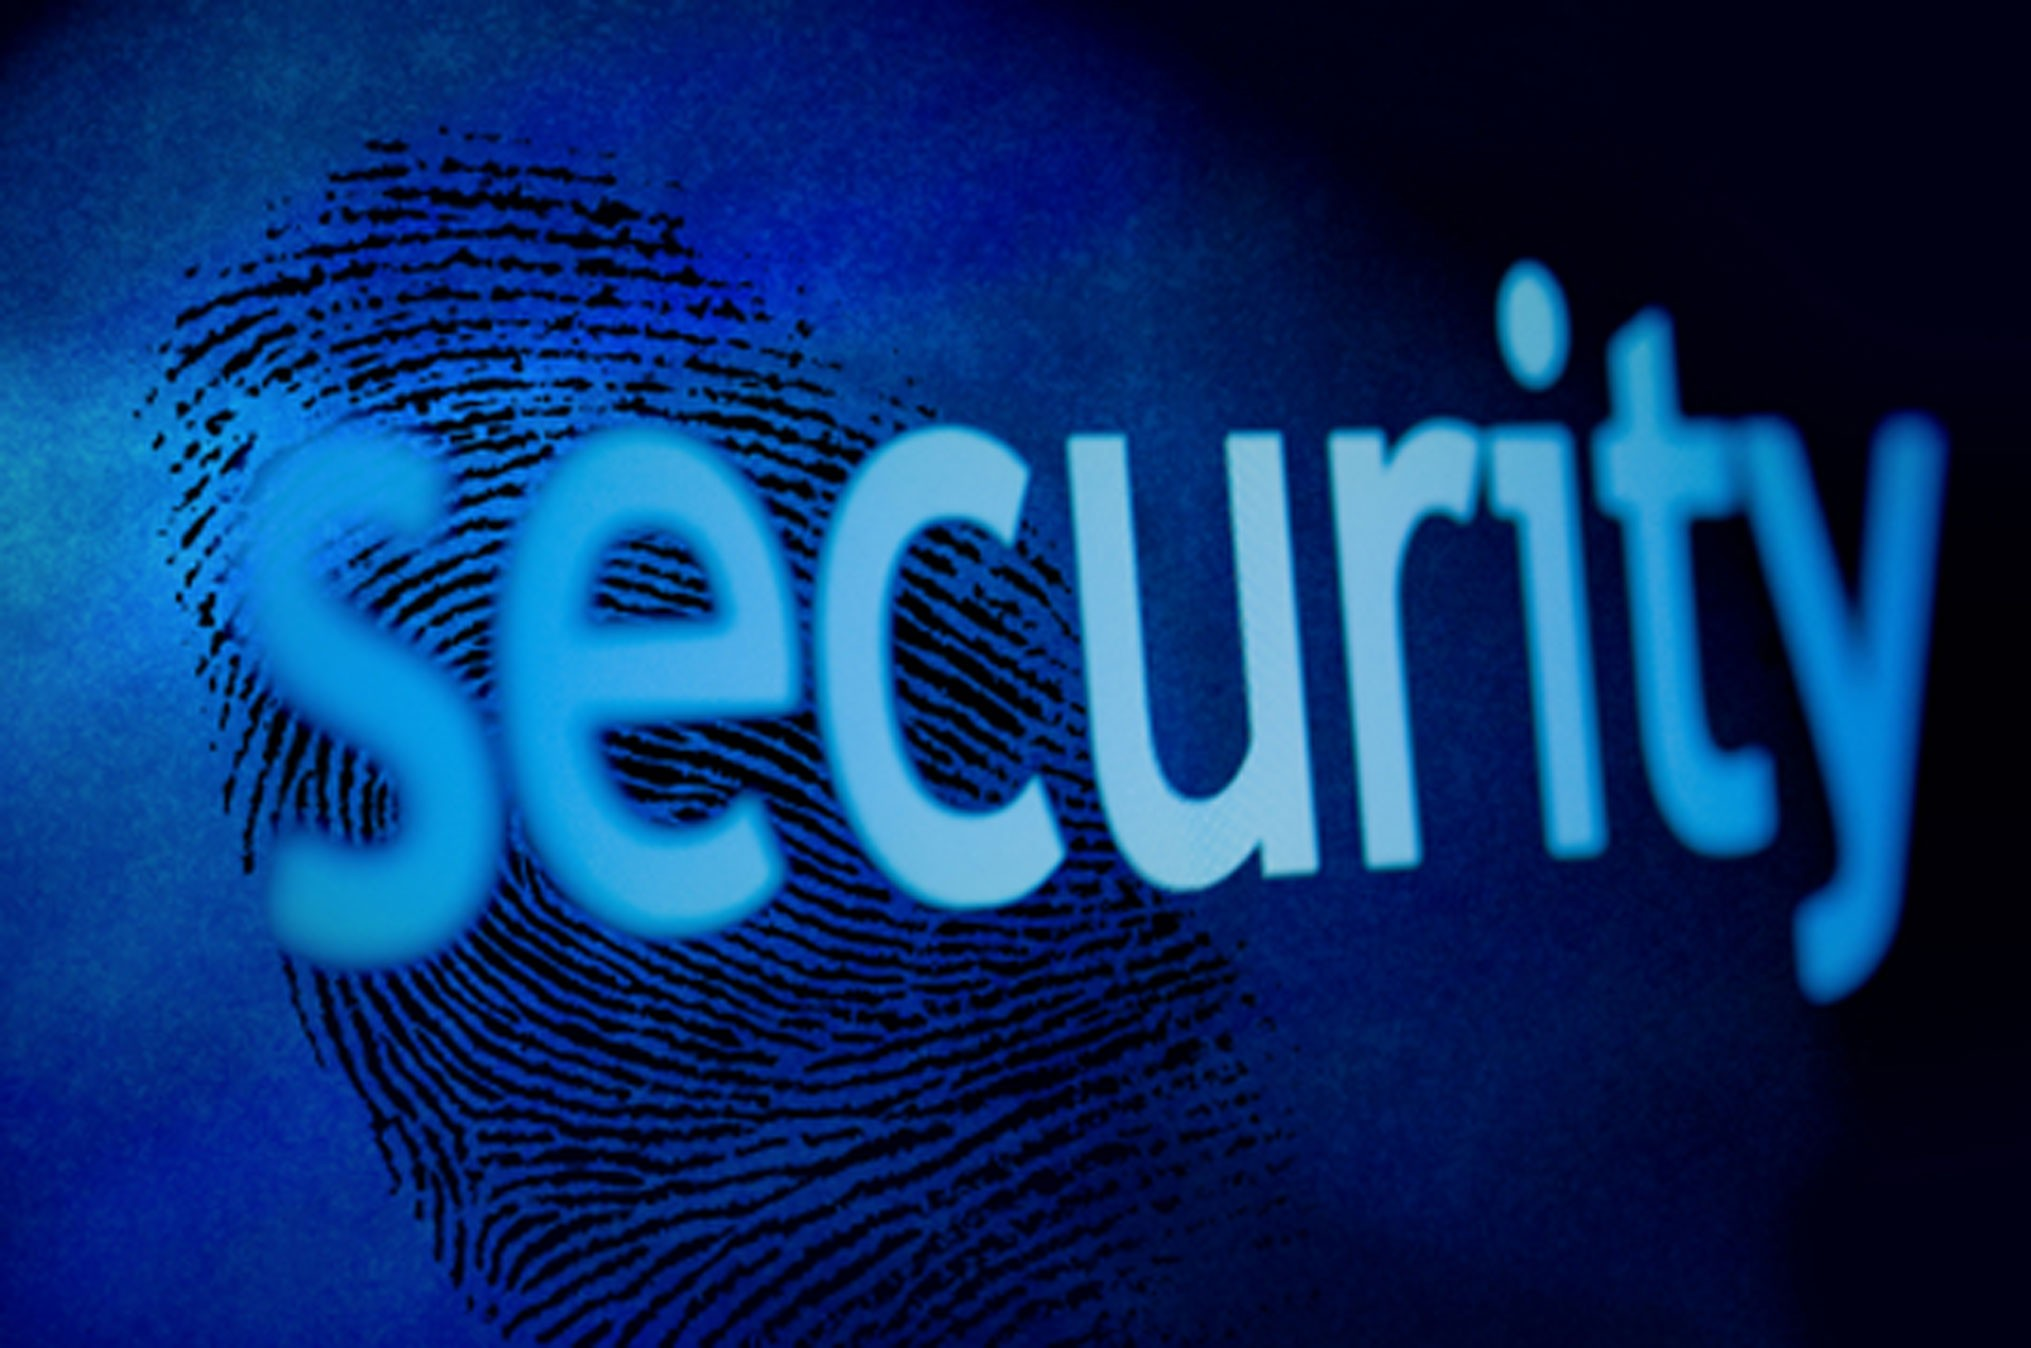 Fireball Securitas & Consultants Pvt  Ltd  & OSSIM | LinkedIn